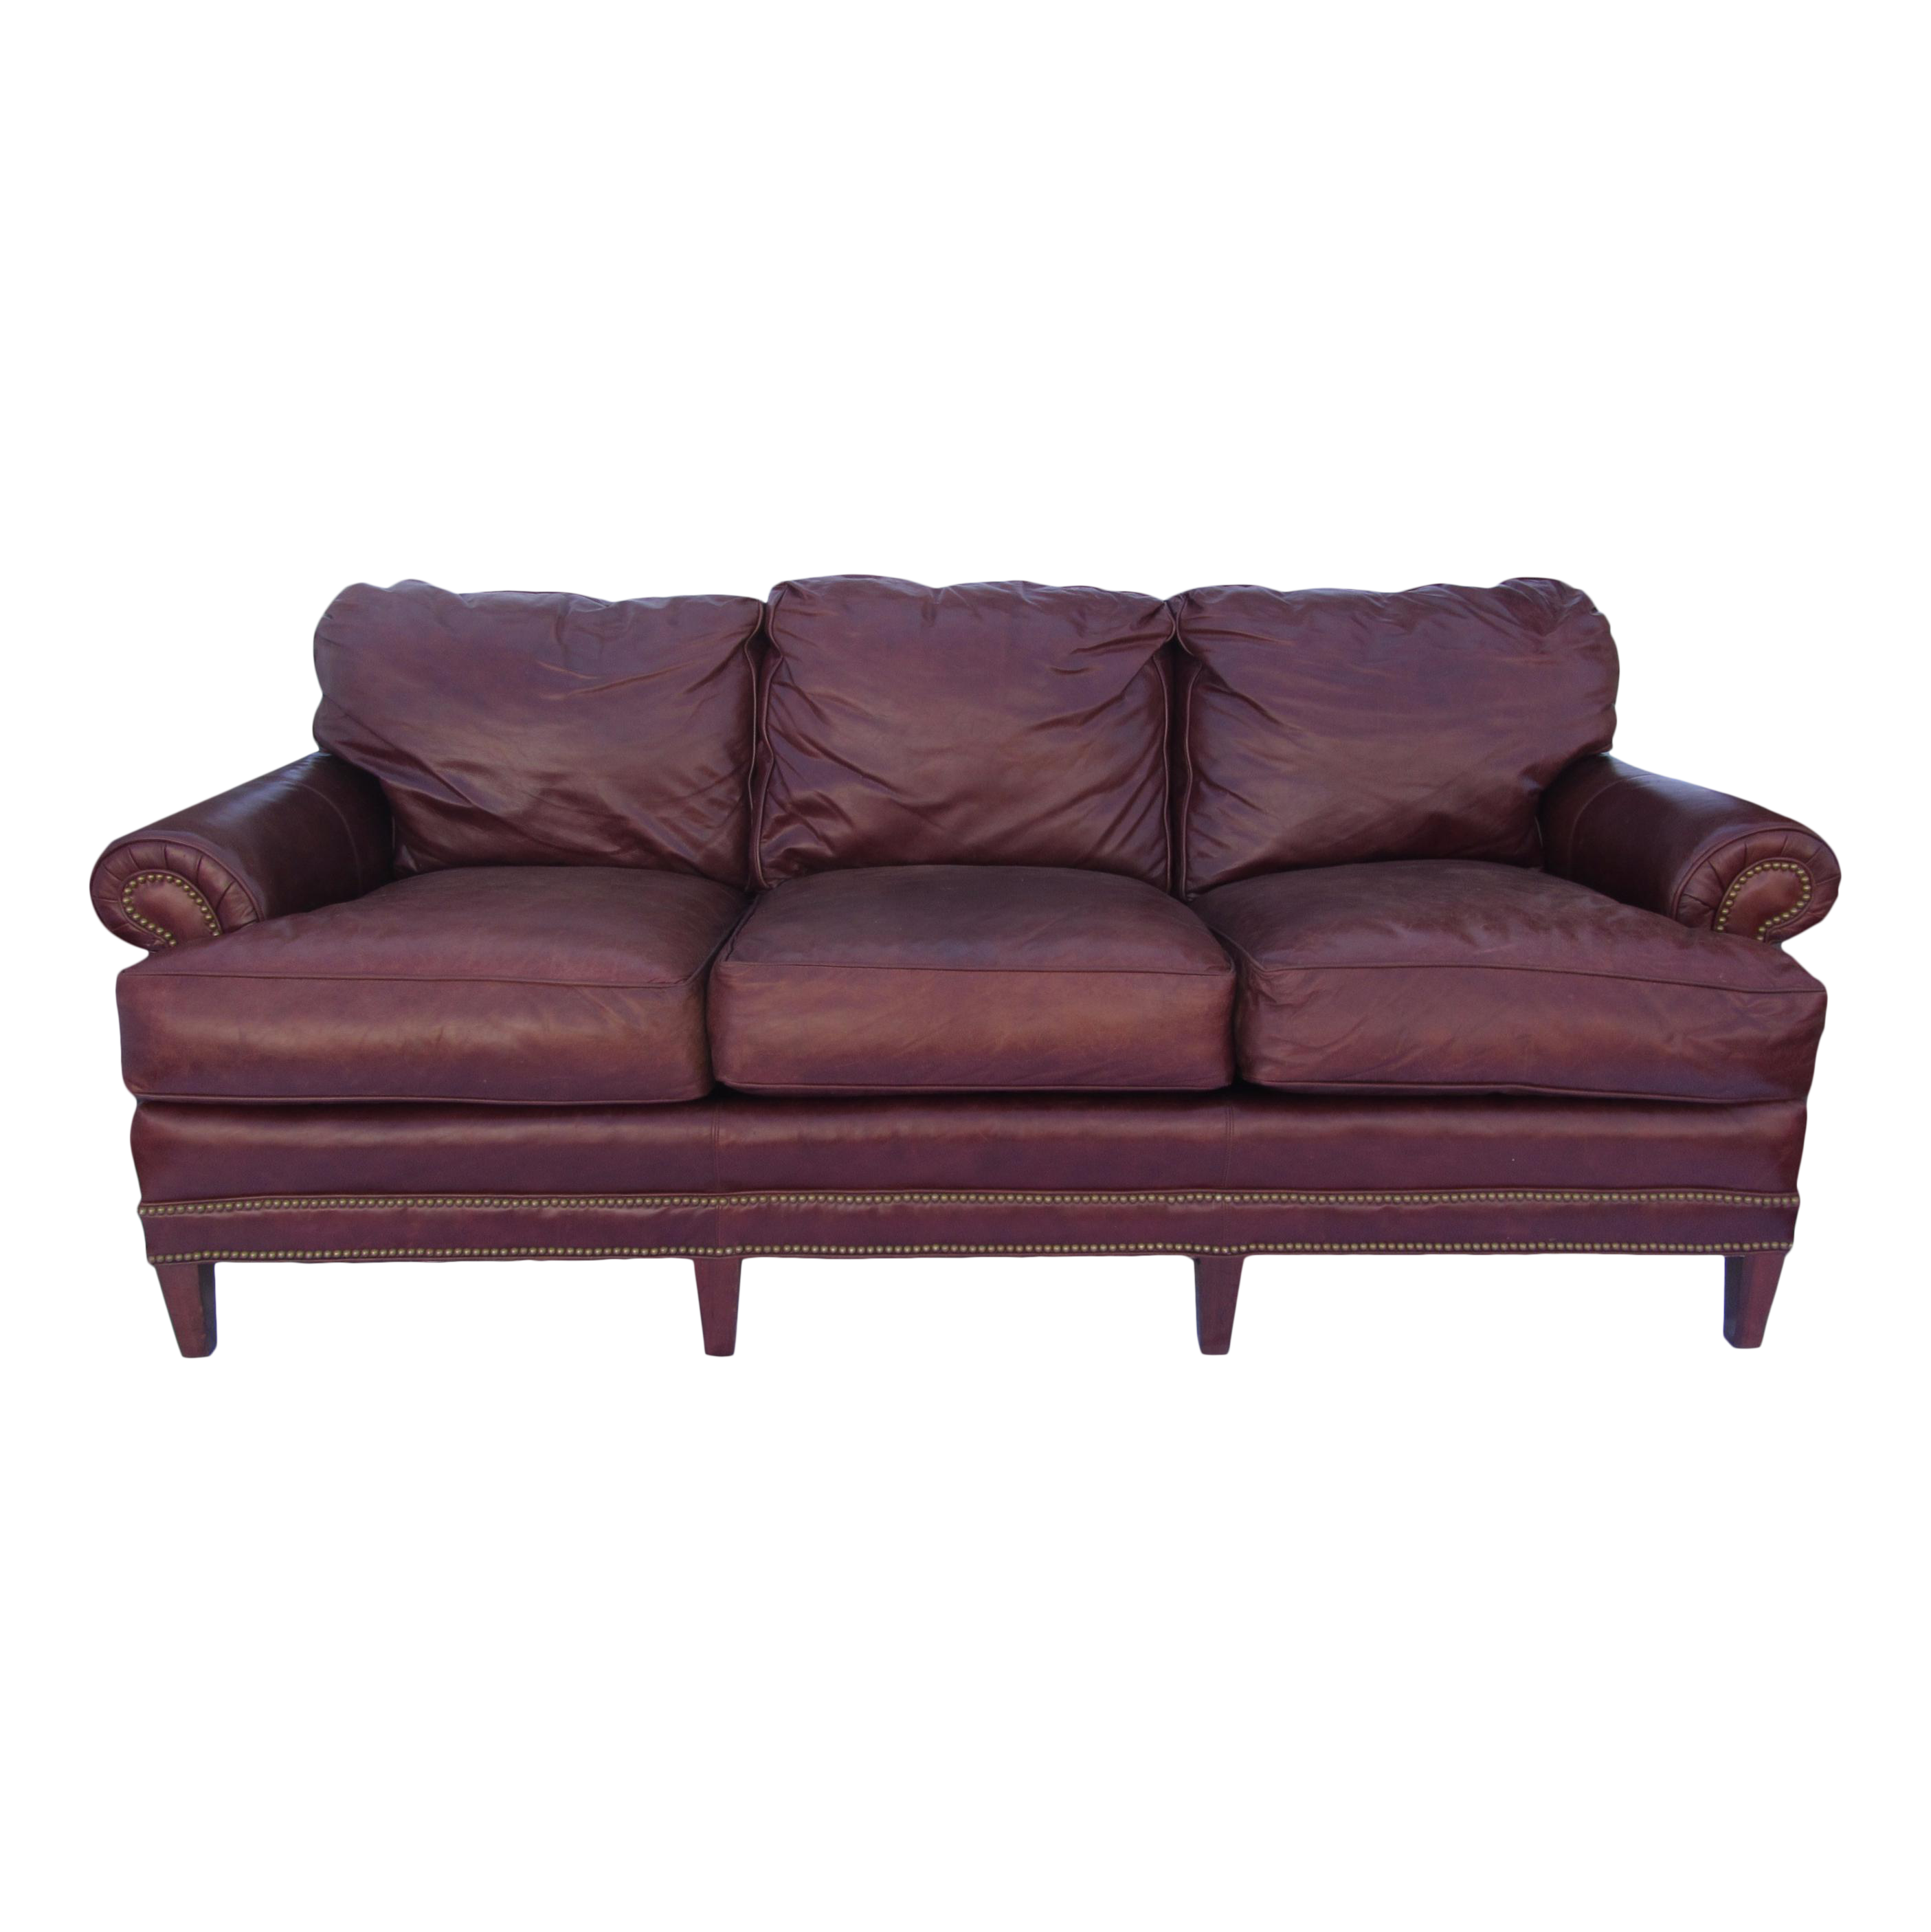 Pearson Chestnut Leather Sofa With Brass Nailhead Trim